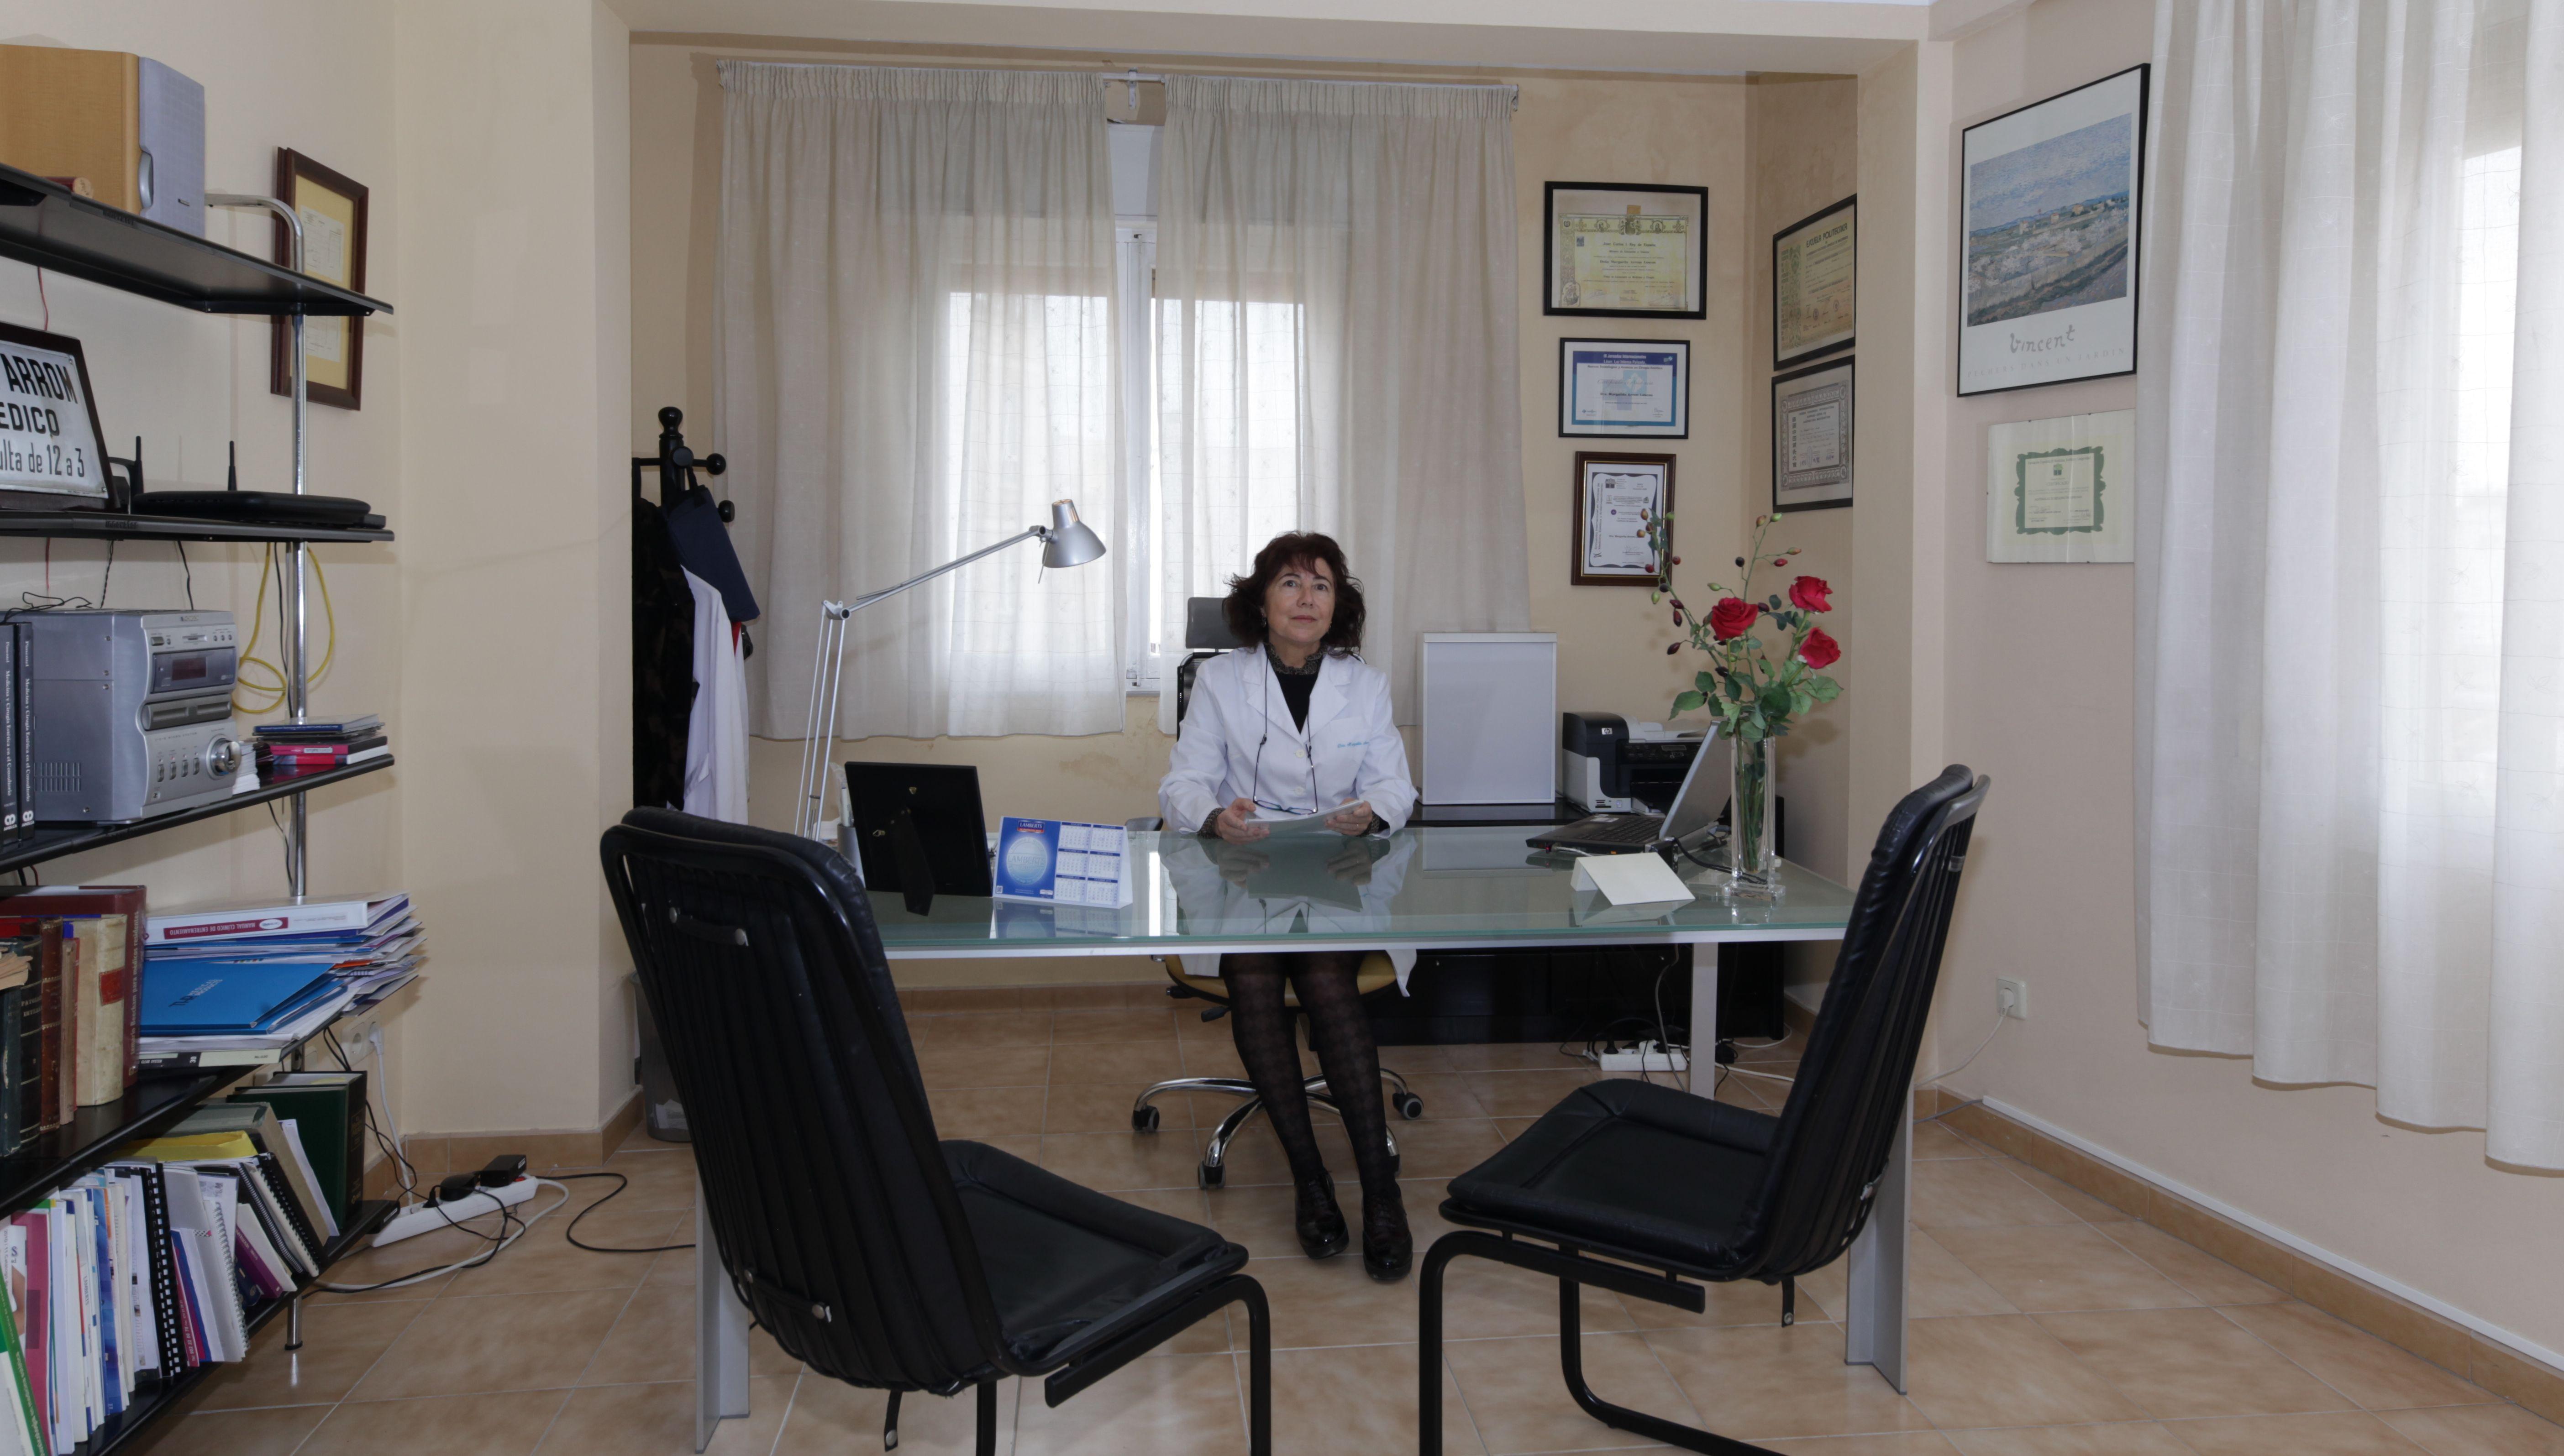 Consulta de la Doctora Arrom